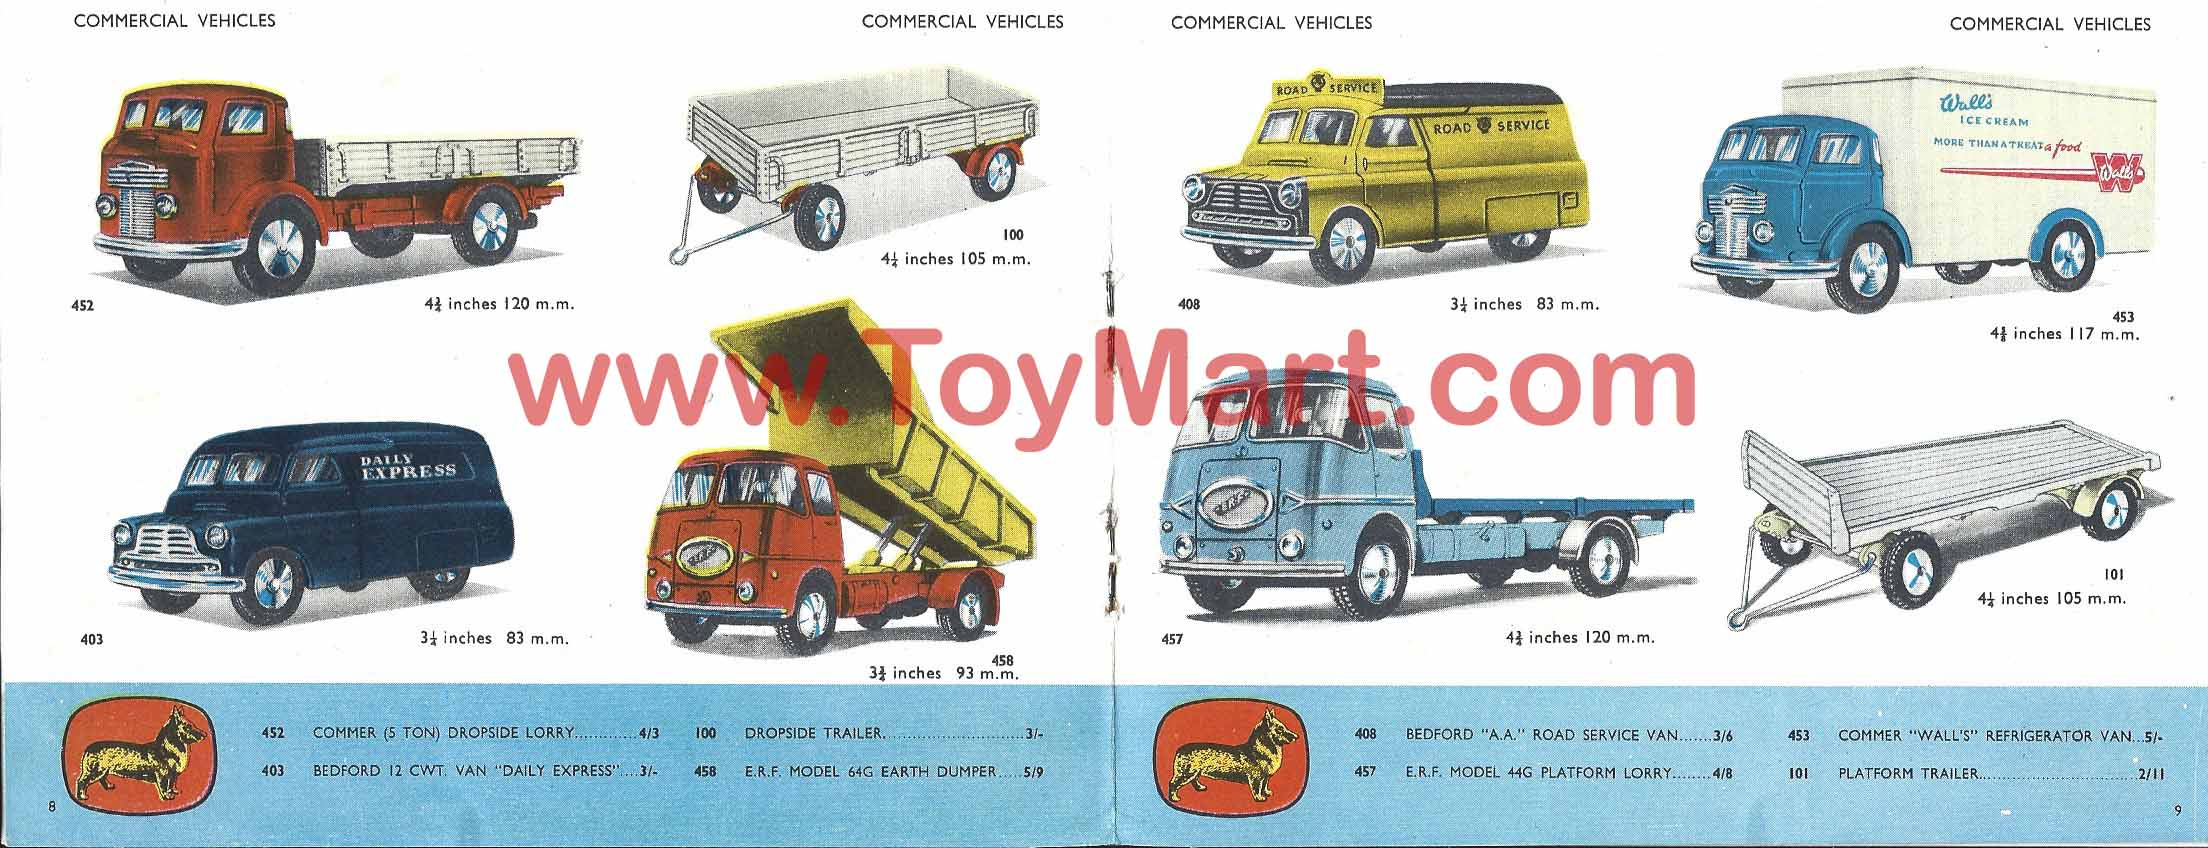 2016 ToyMart.com Ltd. All Rights Reserved: www.toymart.com/catalogues_corgi_1958.php